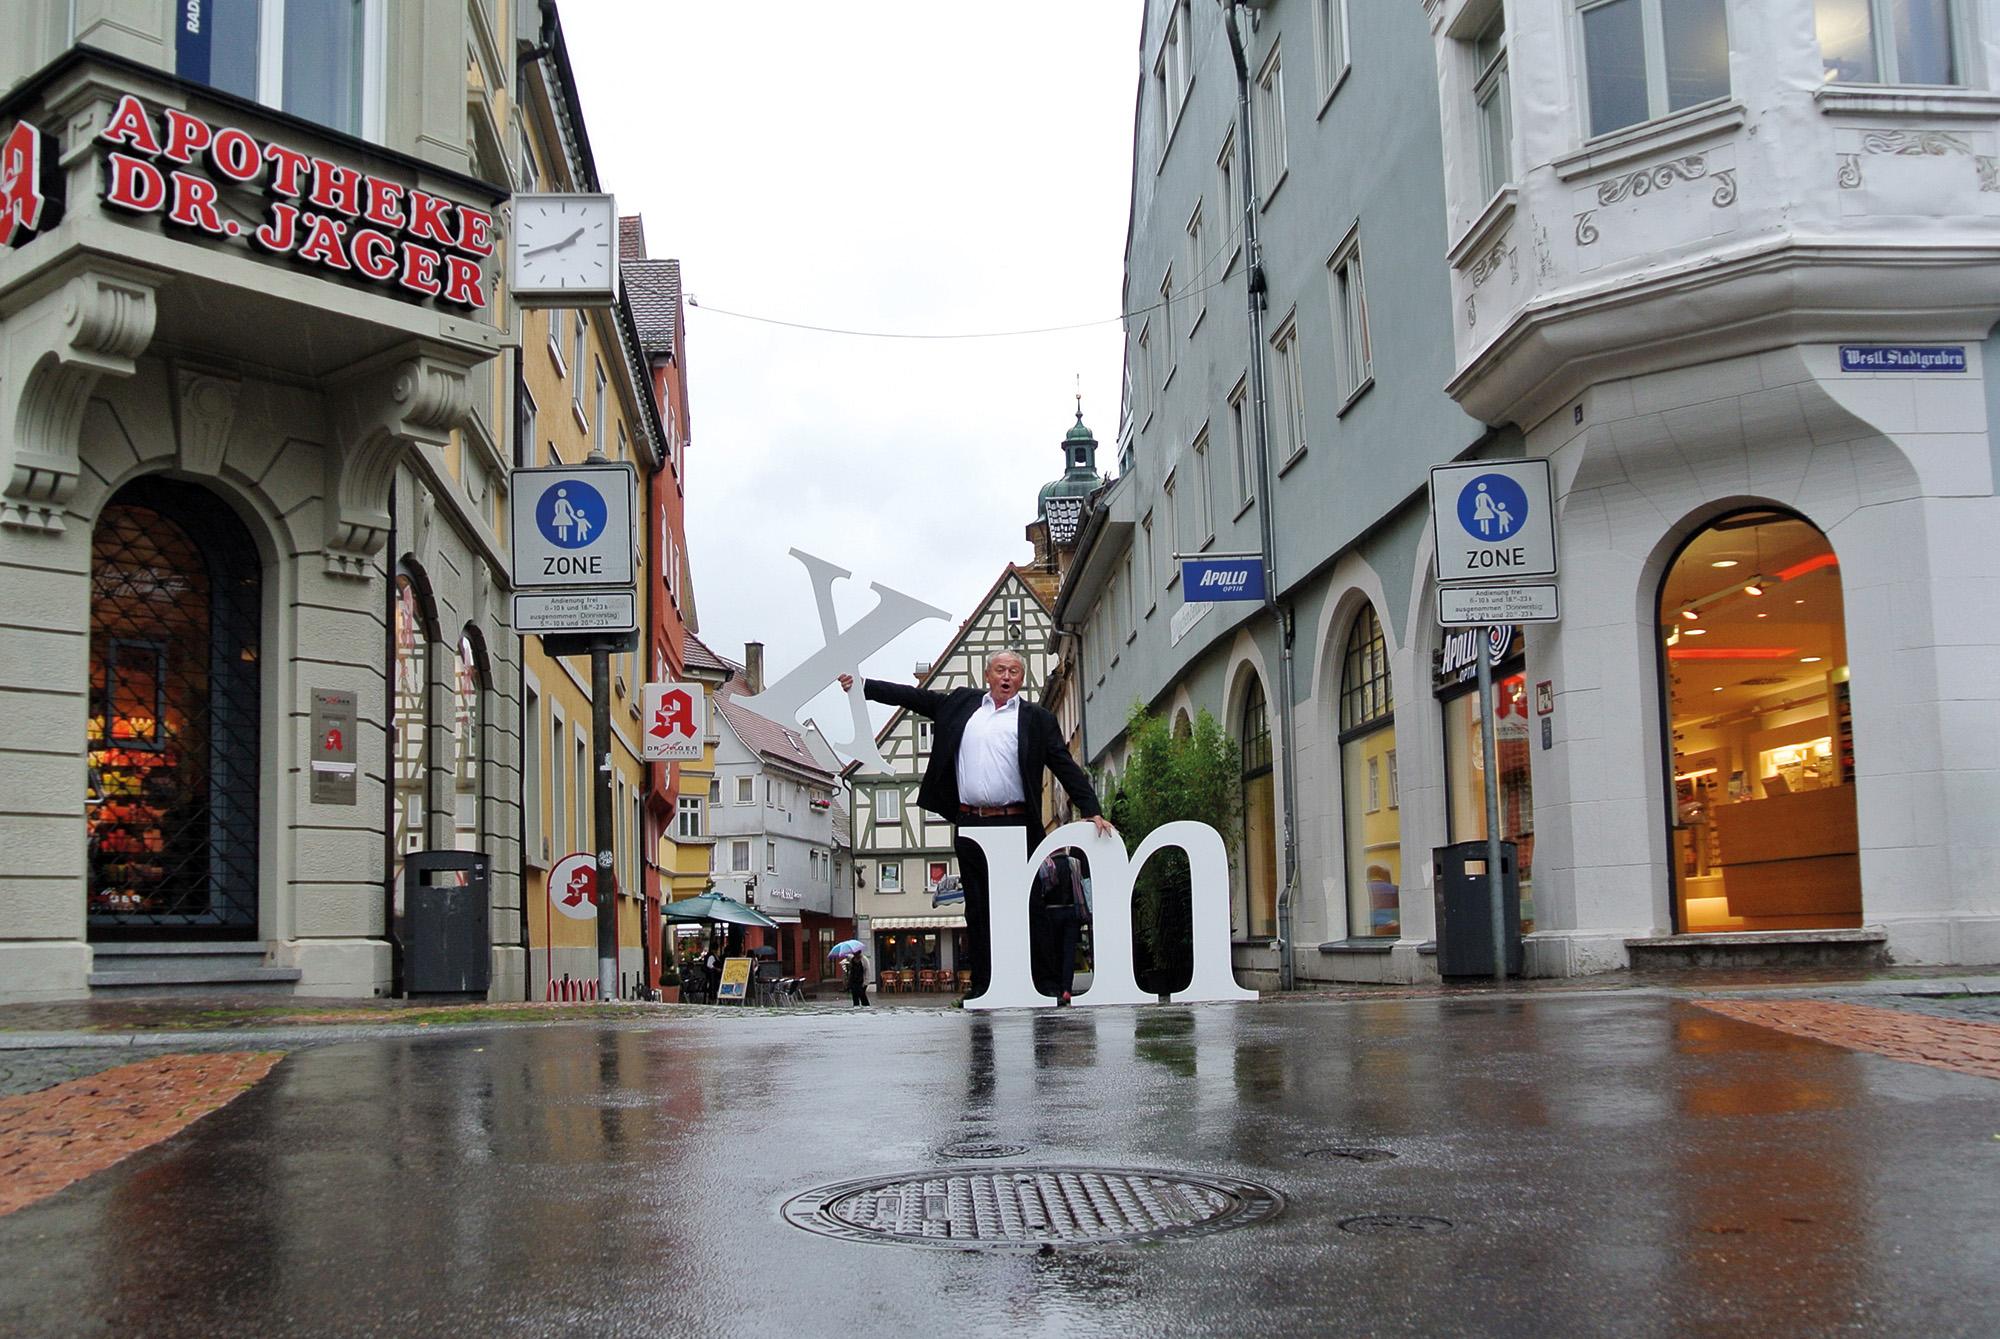 fetzer-partner-projektsteuerung-03-2017-xm